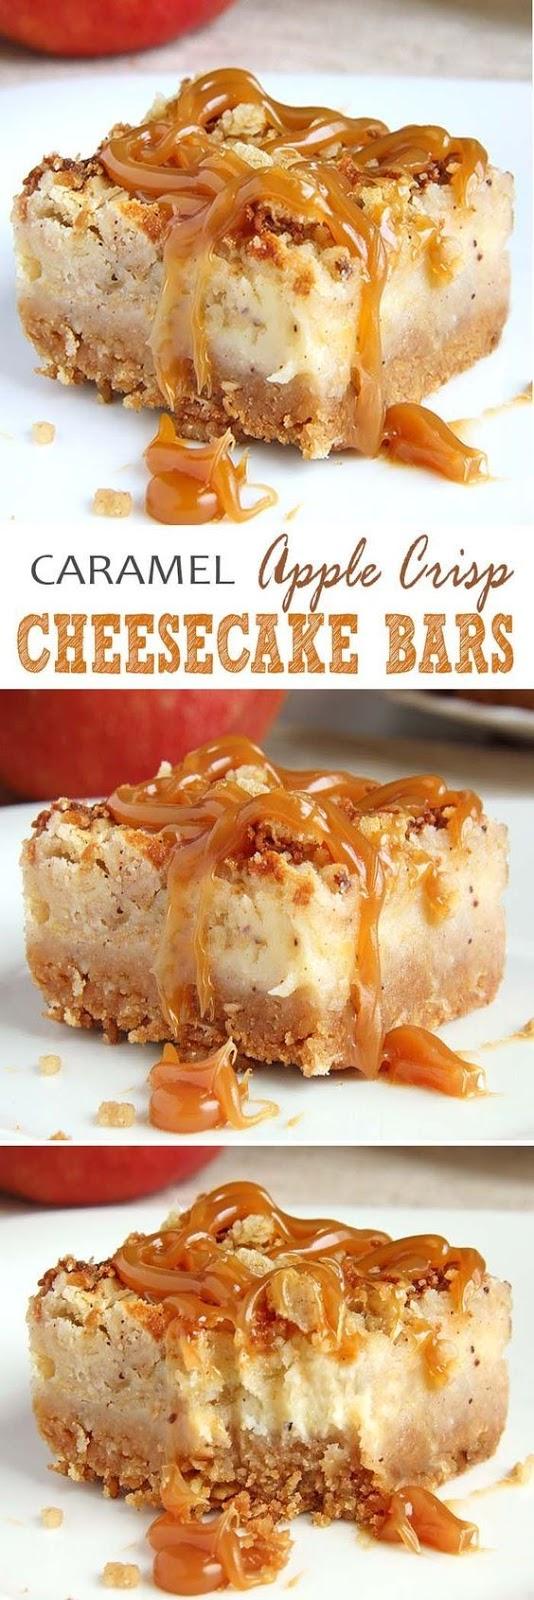 Caramel Apple Crisp Cheesecake Bars